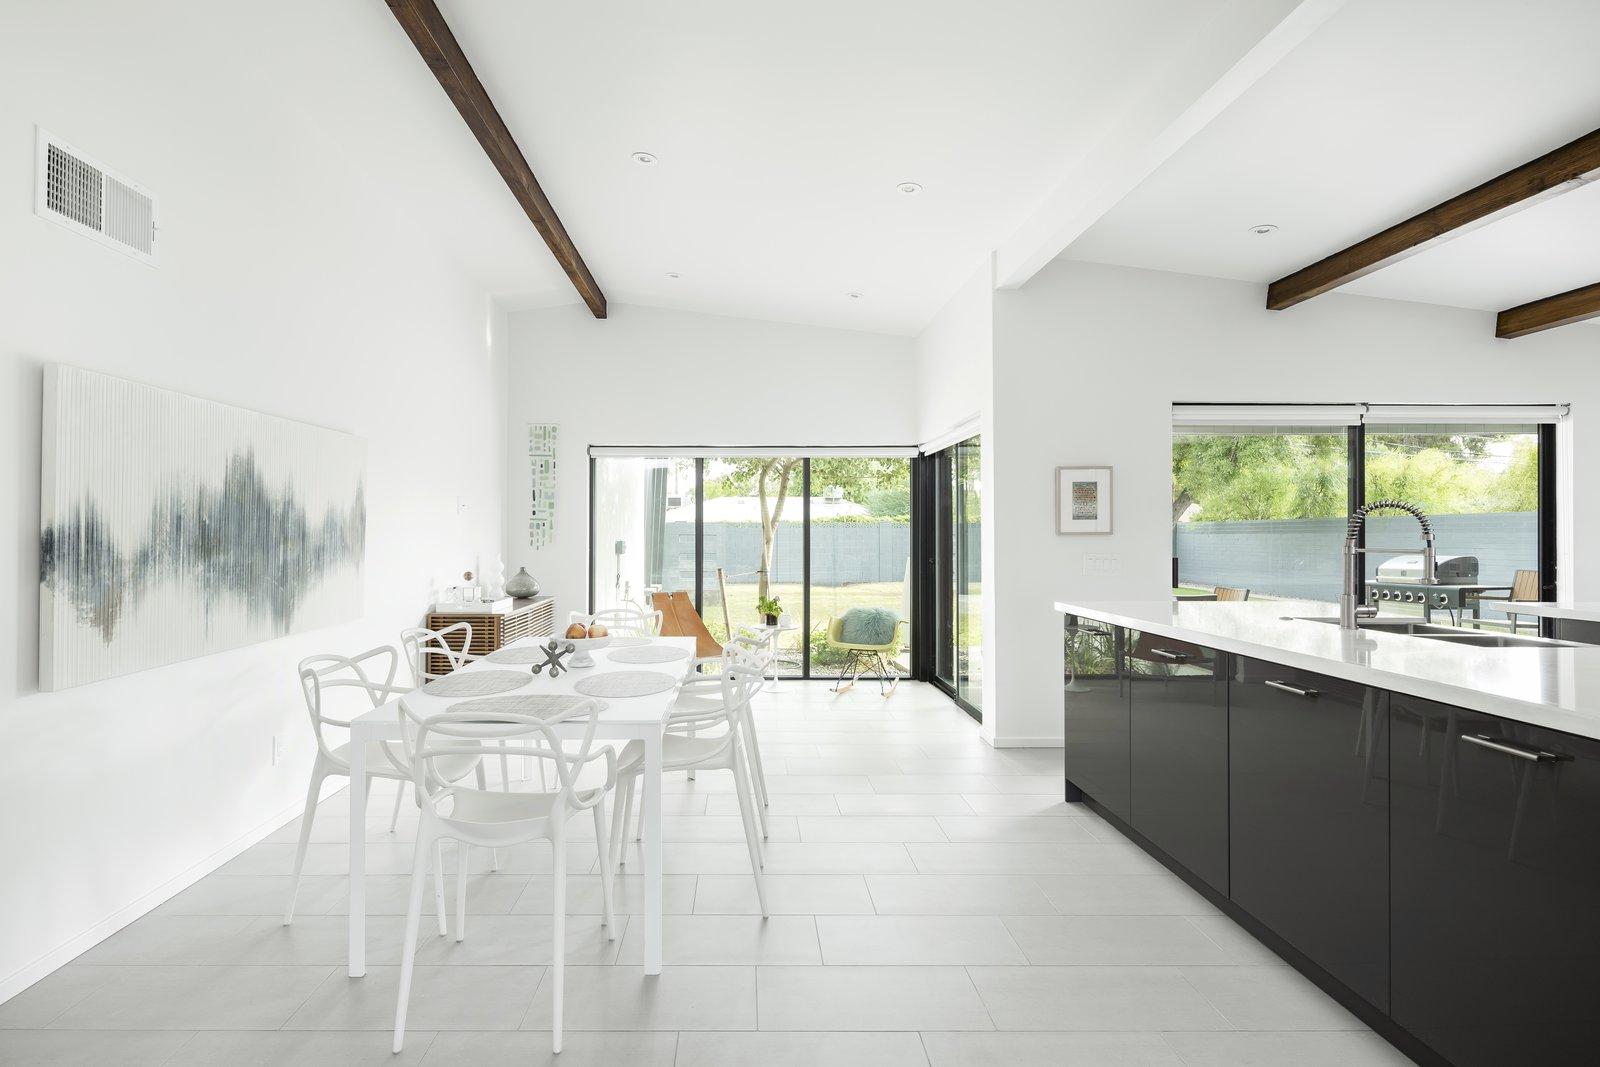 #midcenturymodern #dining #kitchen #interior #phoenix #arizona